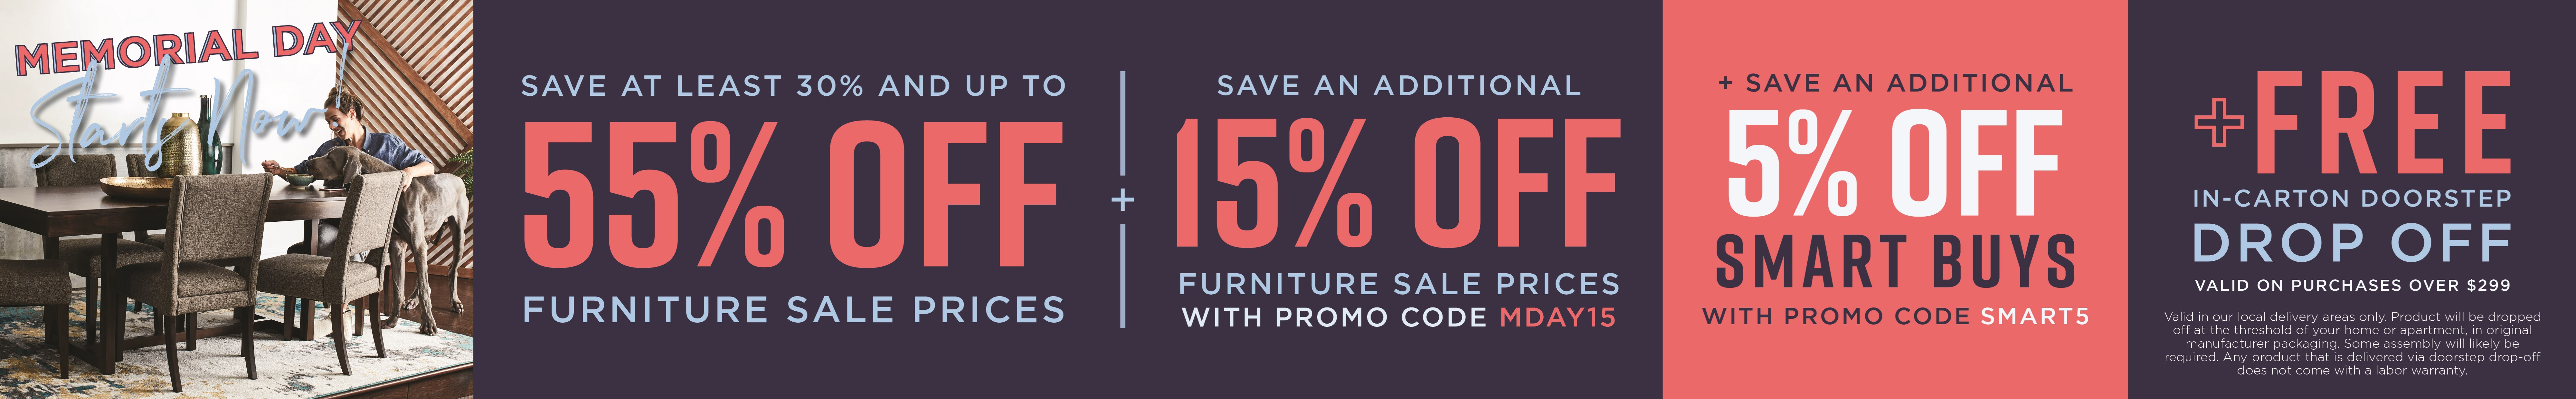 Furniture & ApplianceMart Memorial Day Sale